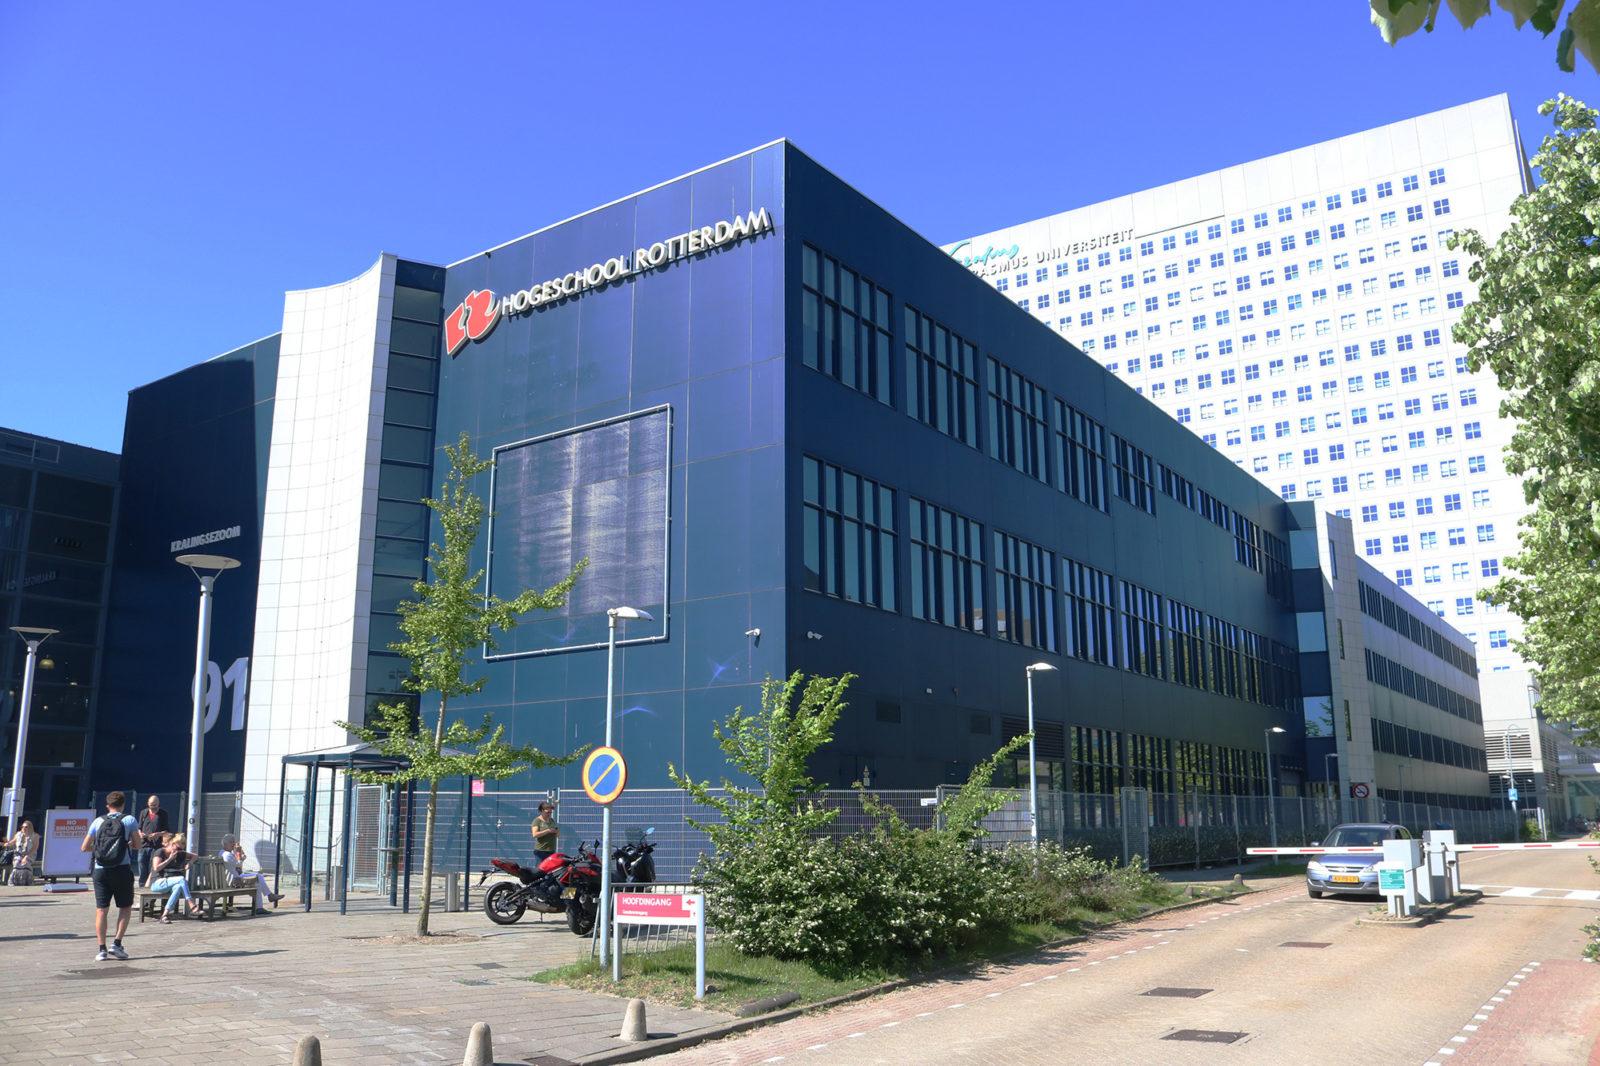 kralingse-zoom-hogeschool-rotterdam-business-school-gebouw-c-2-foto-Elmer-Smaling